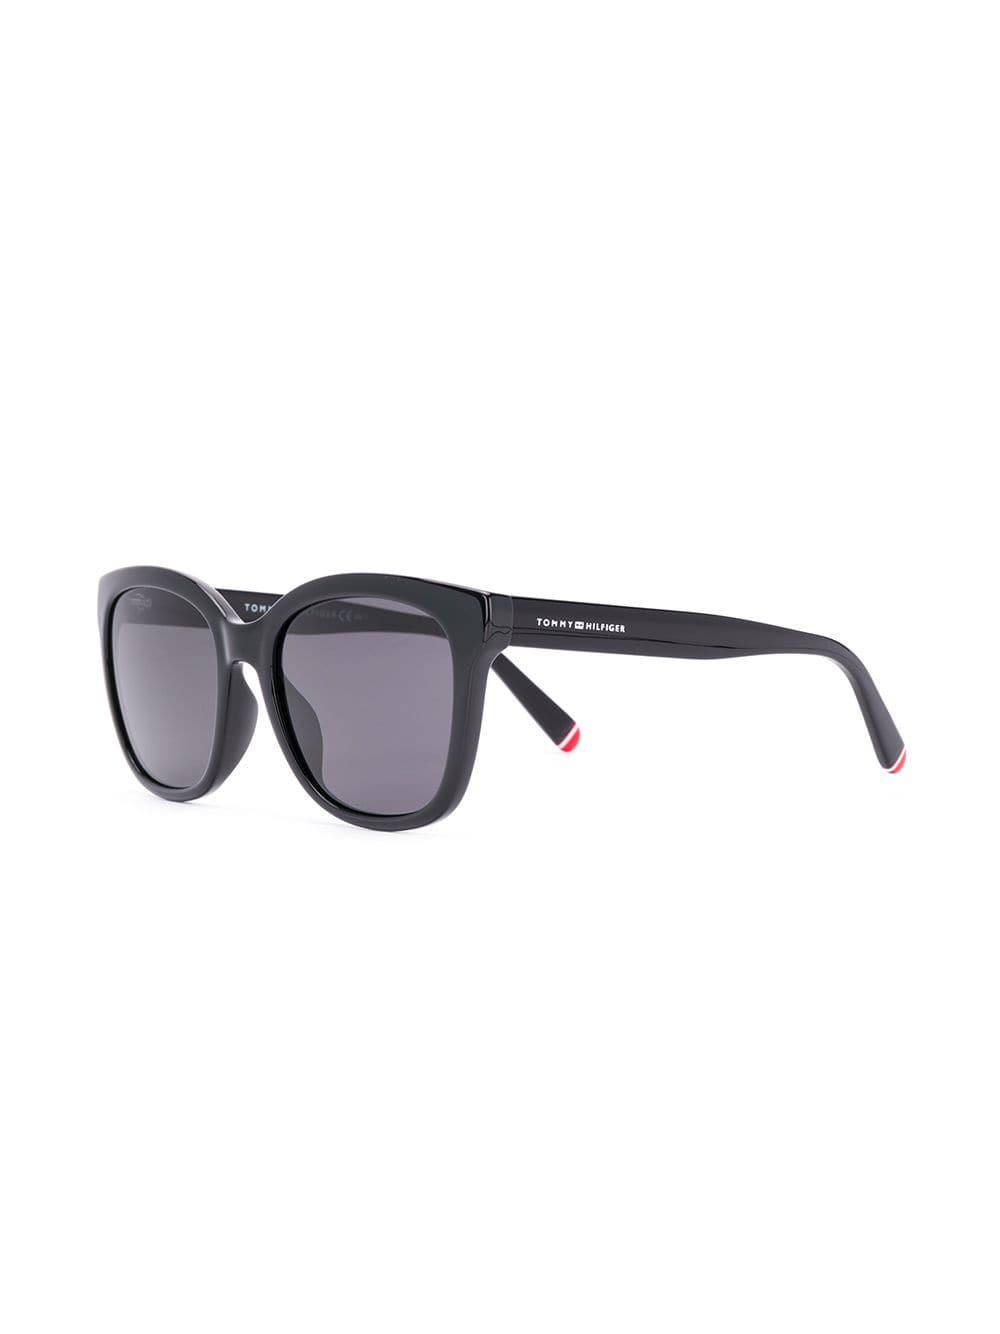 496ca379173 Tommy Hilfiger - Black Square Frame Sunglasses - Lyst. View fullscreen